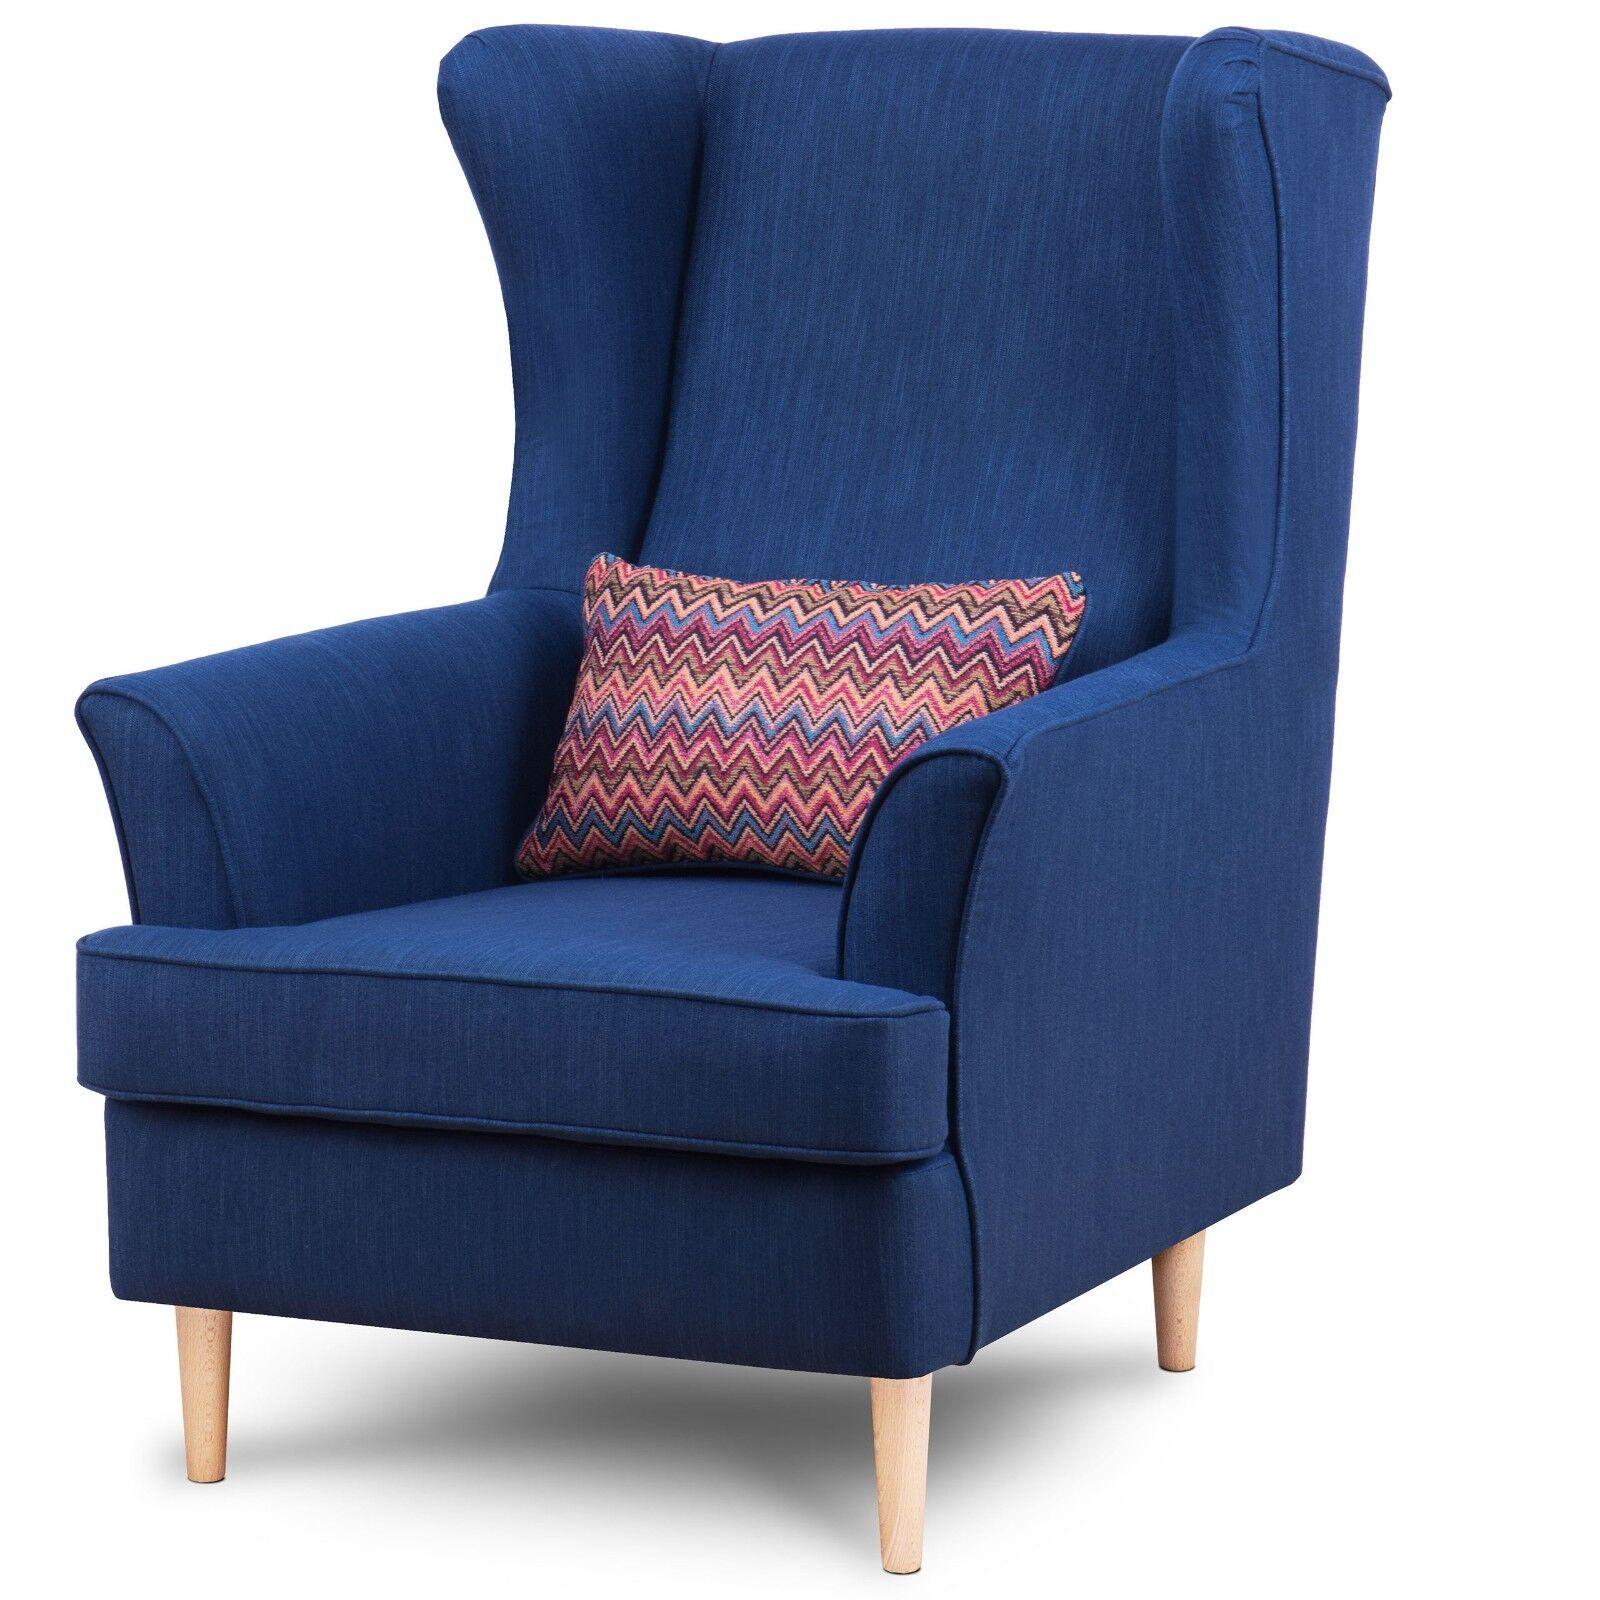 Sessel Ohrensessel Fernsehsessel Wohnzimmersessel Couchsessel Stillsessel Hocker